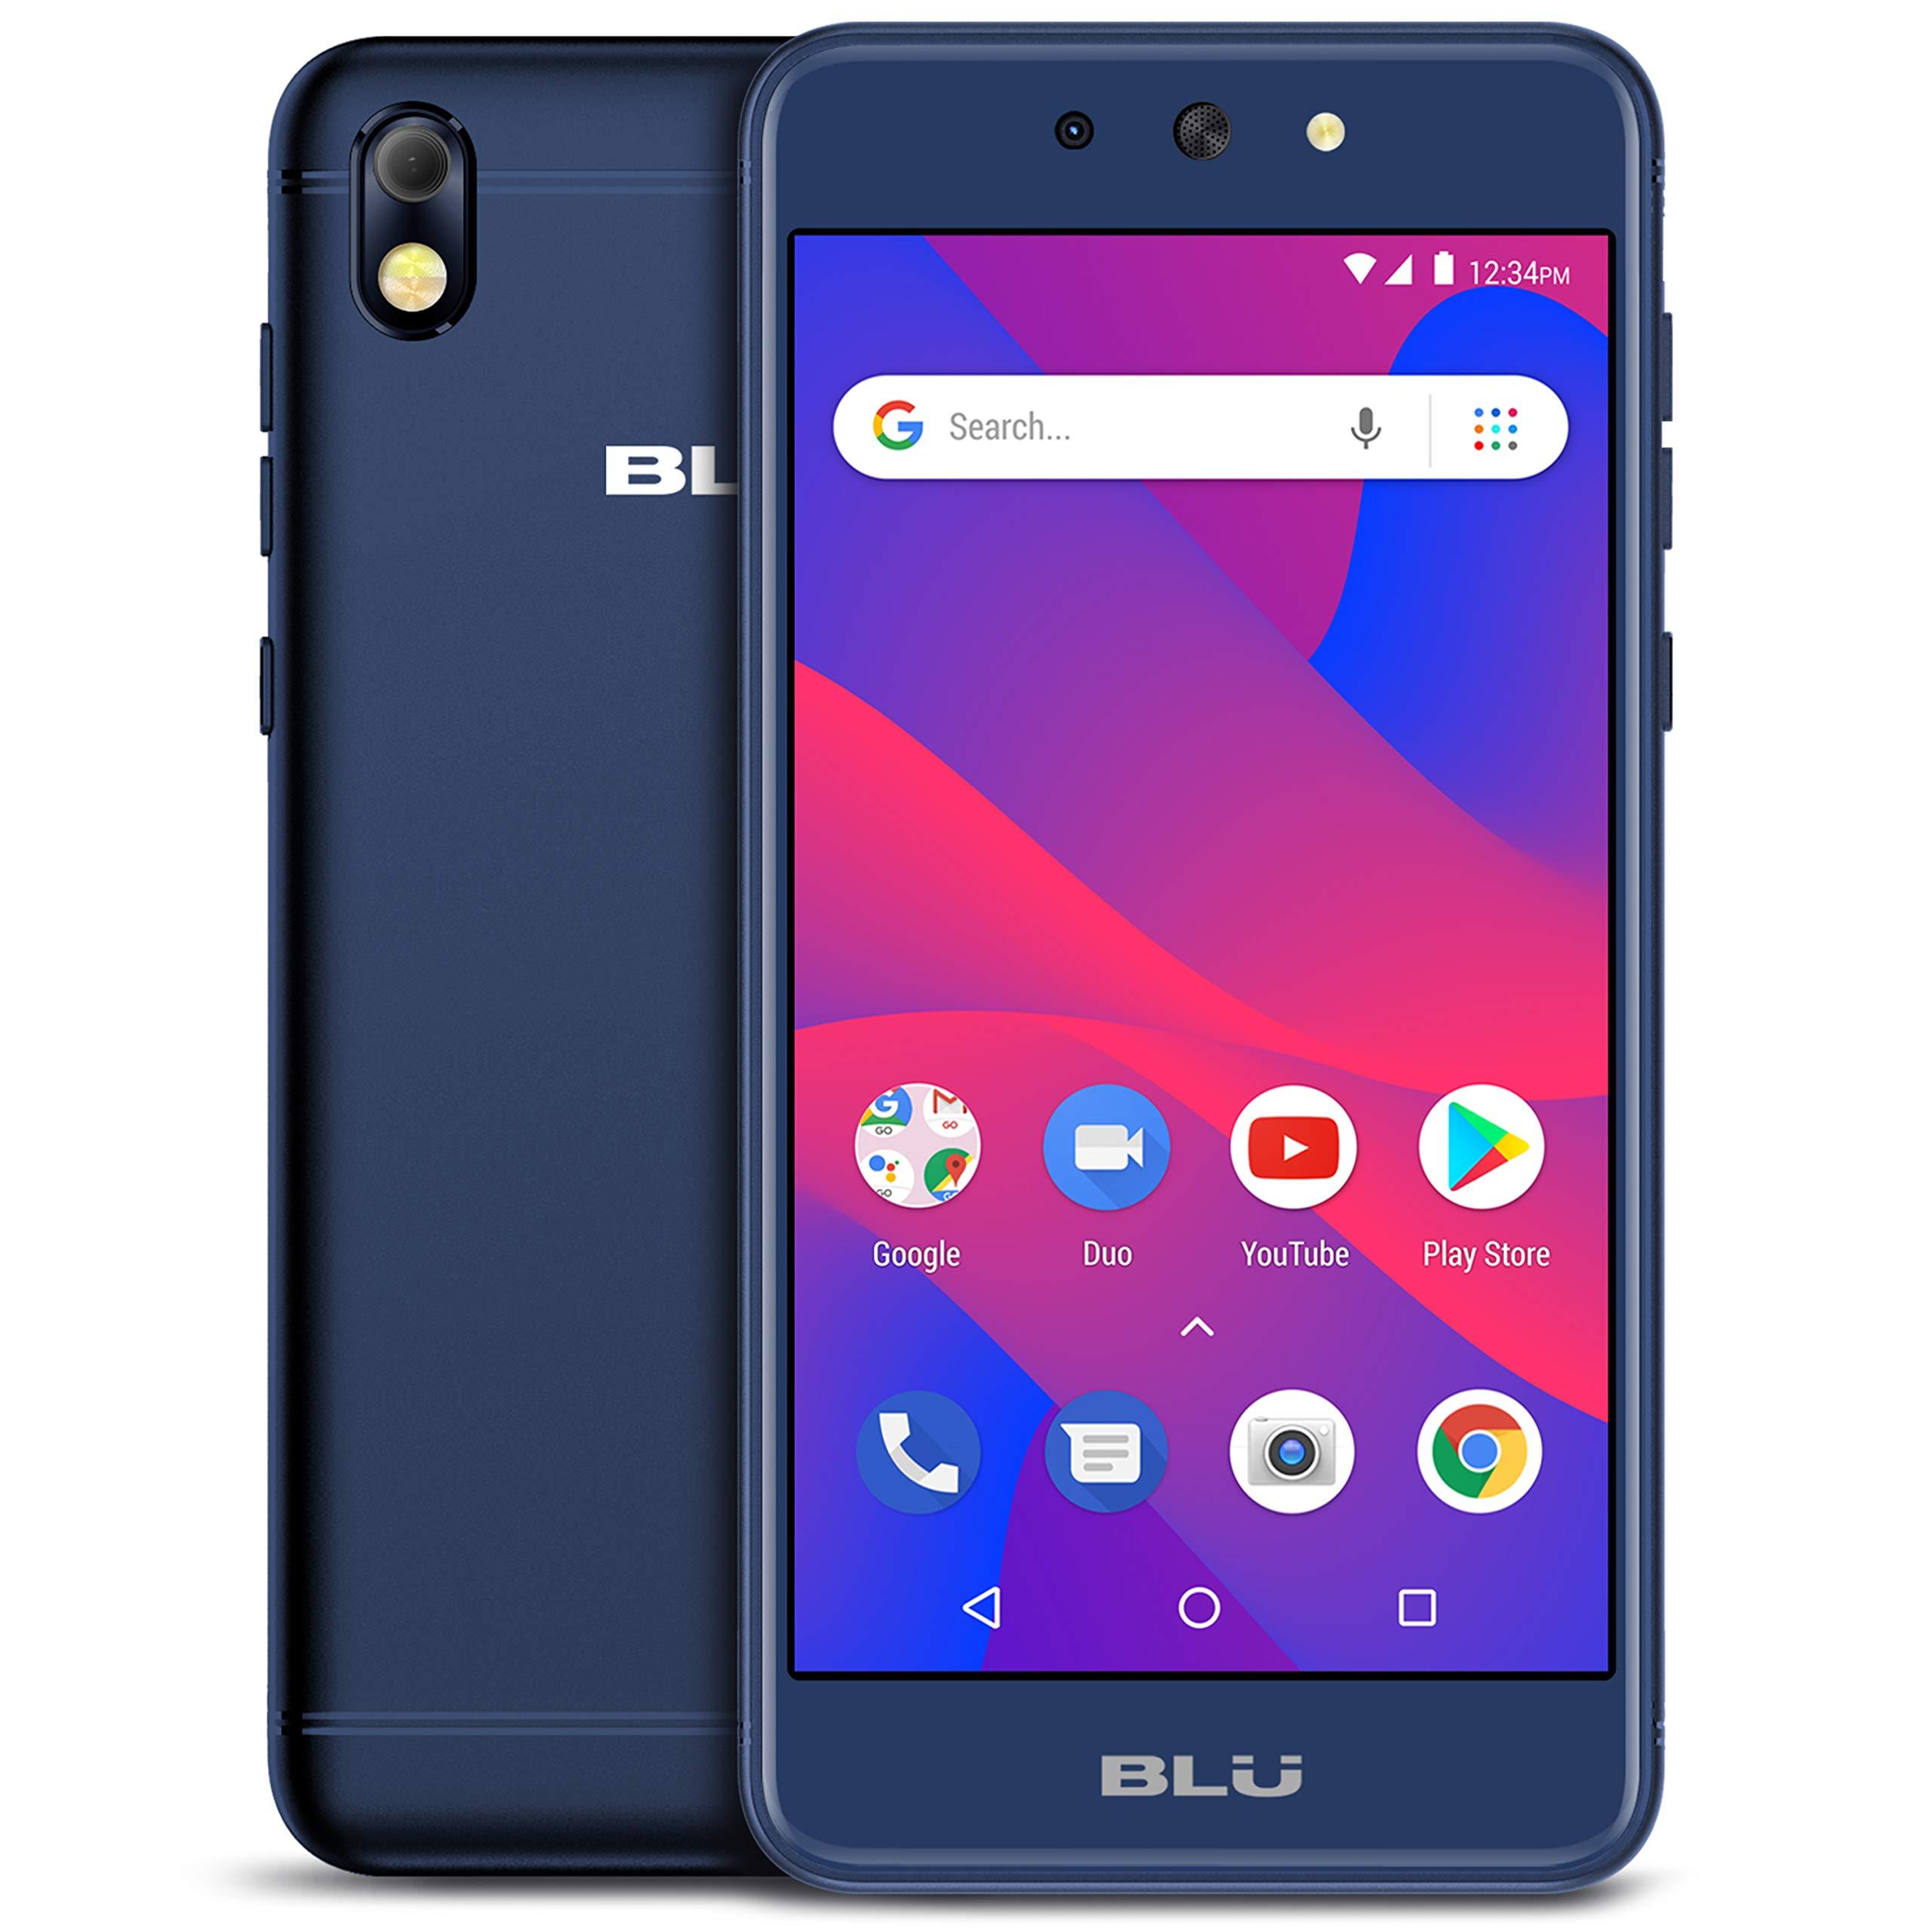 BLU Advance 5.2 HD - GSM Unlocked Smartphone, 16Gb+1Gb Ram -Blue by BLU